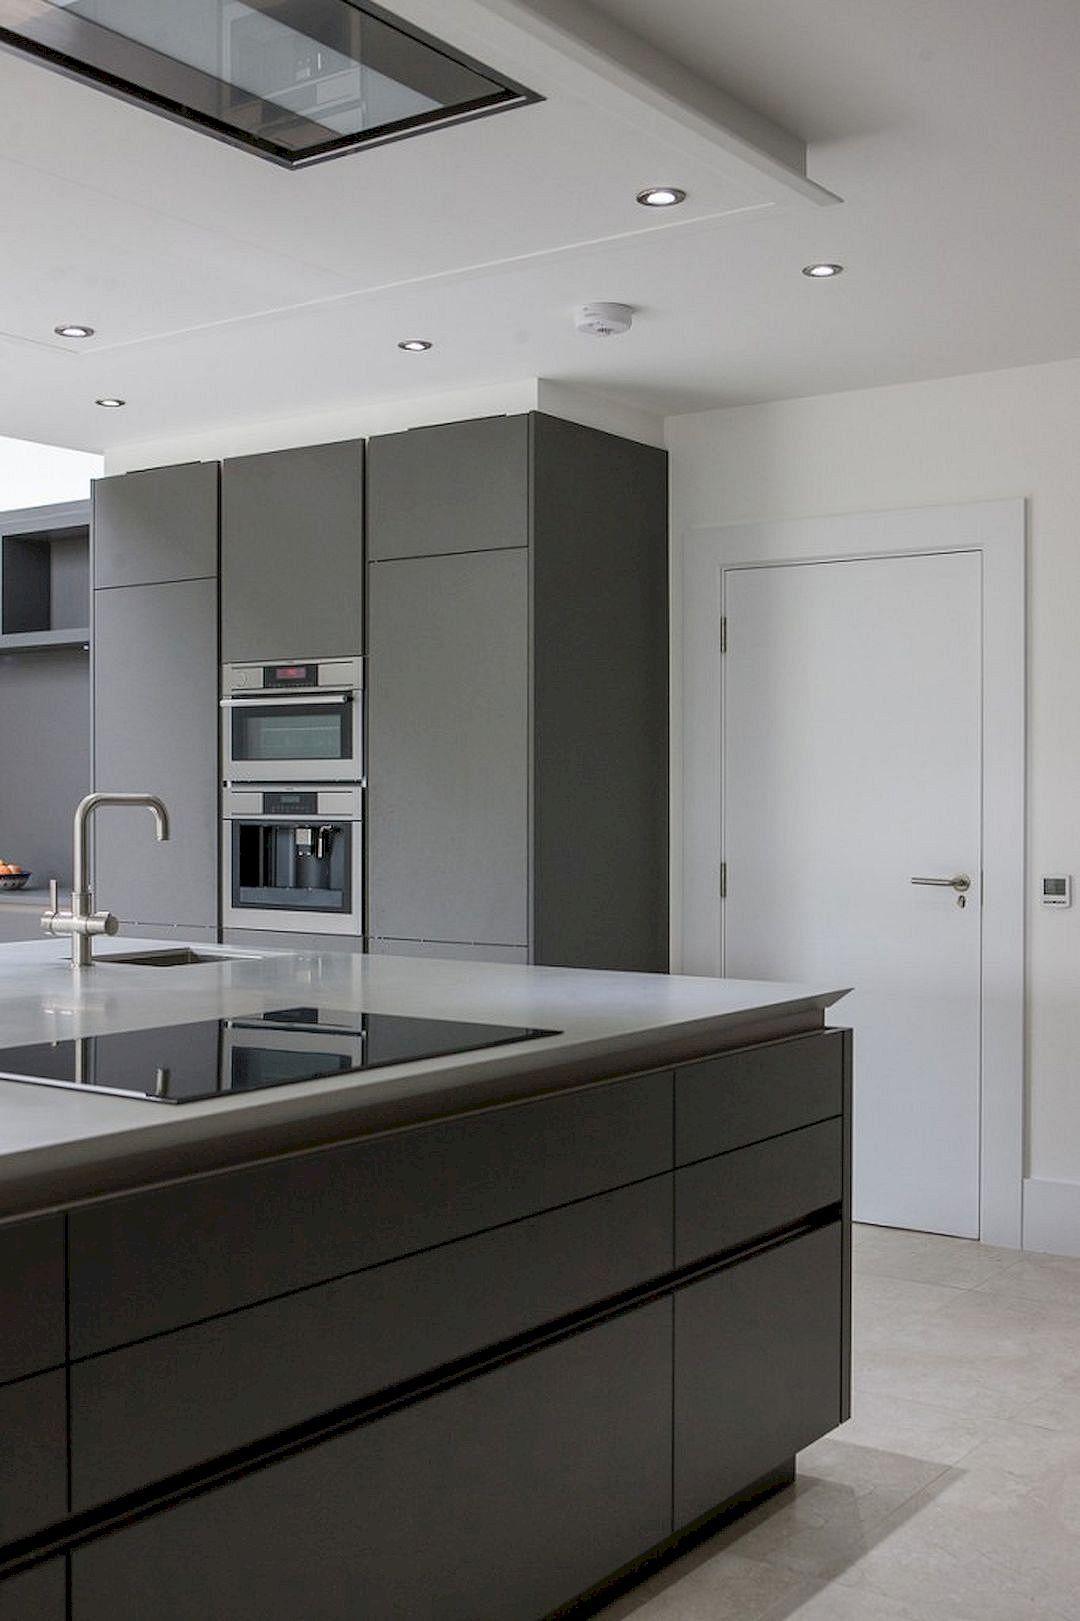 Perfectly Designed Modern Kitchen Inspirations (165 Photos)  Https://www.futuristarchitecture.com/22124 Modern Kitchen Designs.html